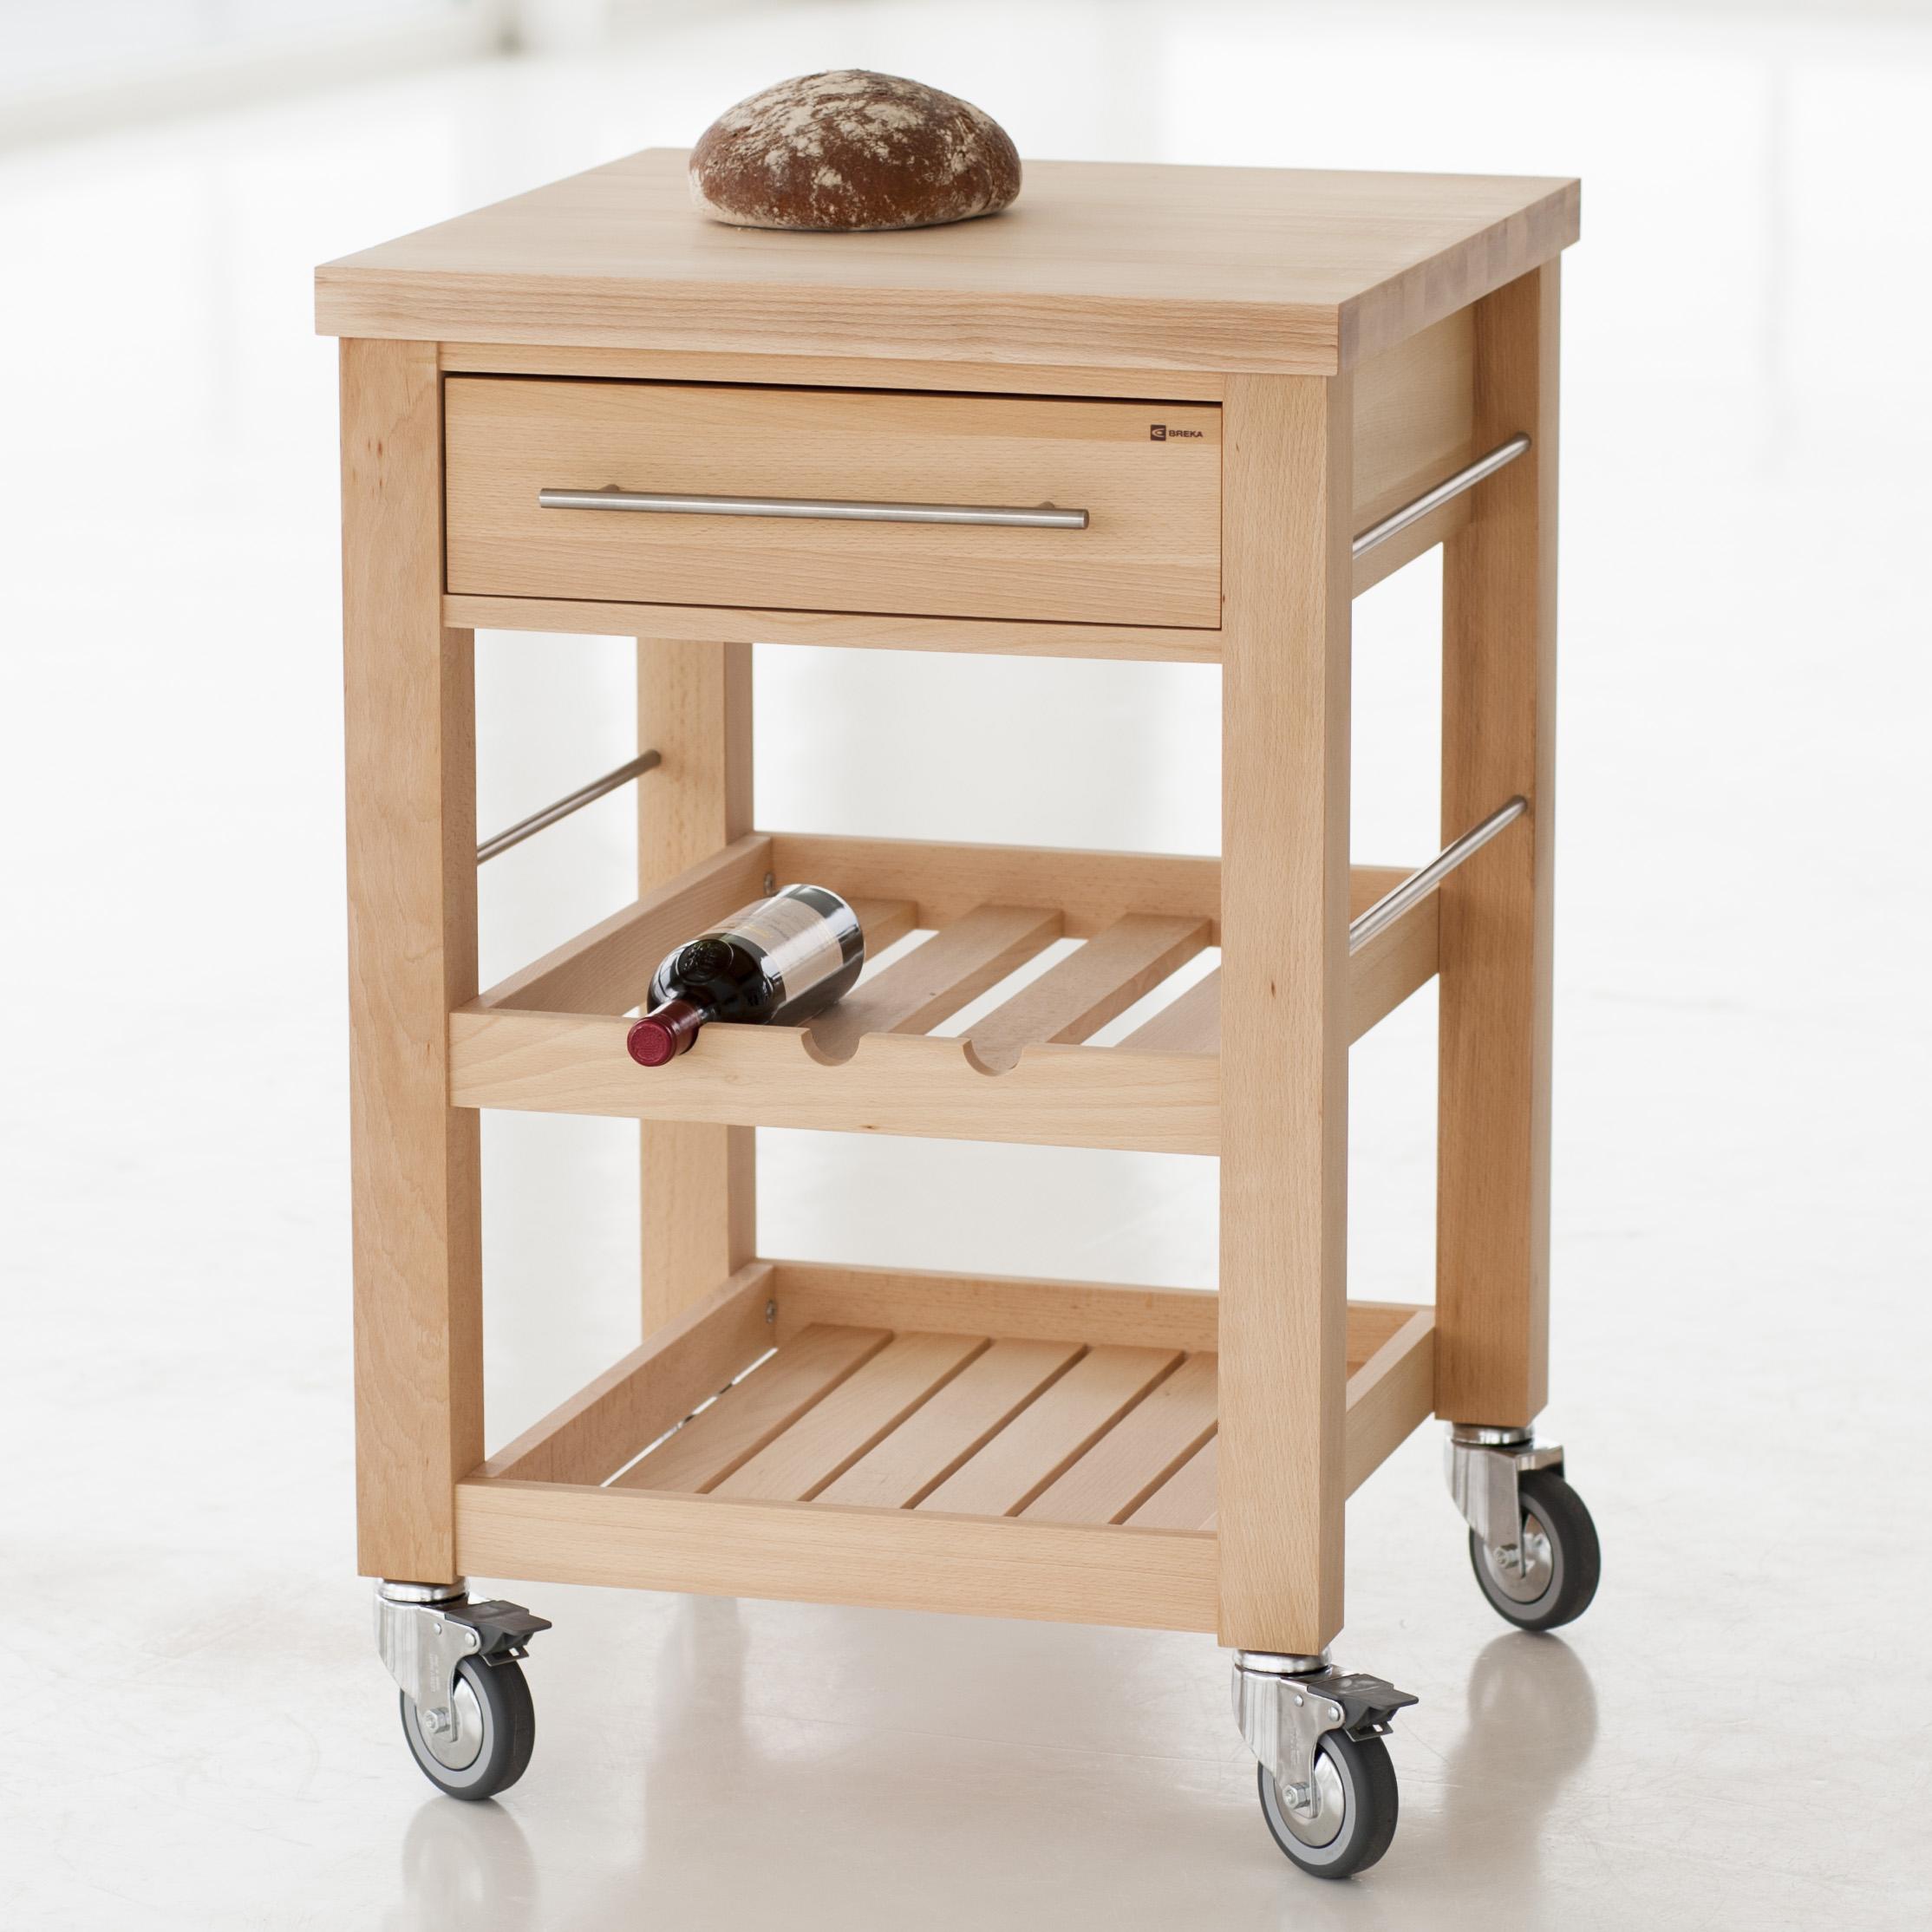 Mobiler Küchentisch Buche 60 Cm Bei Torquato.de